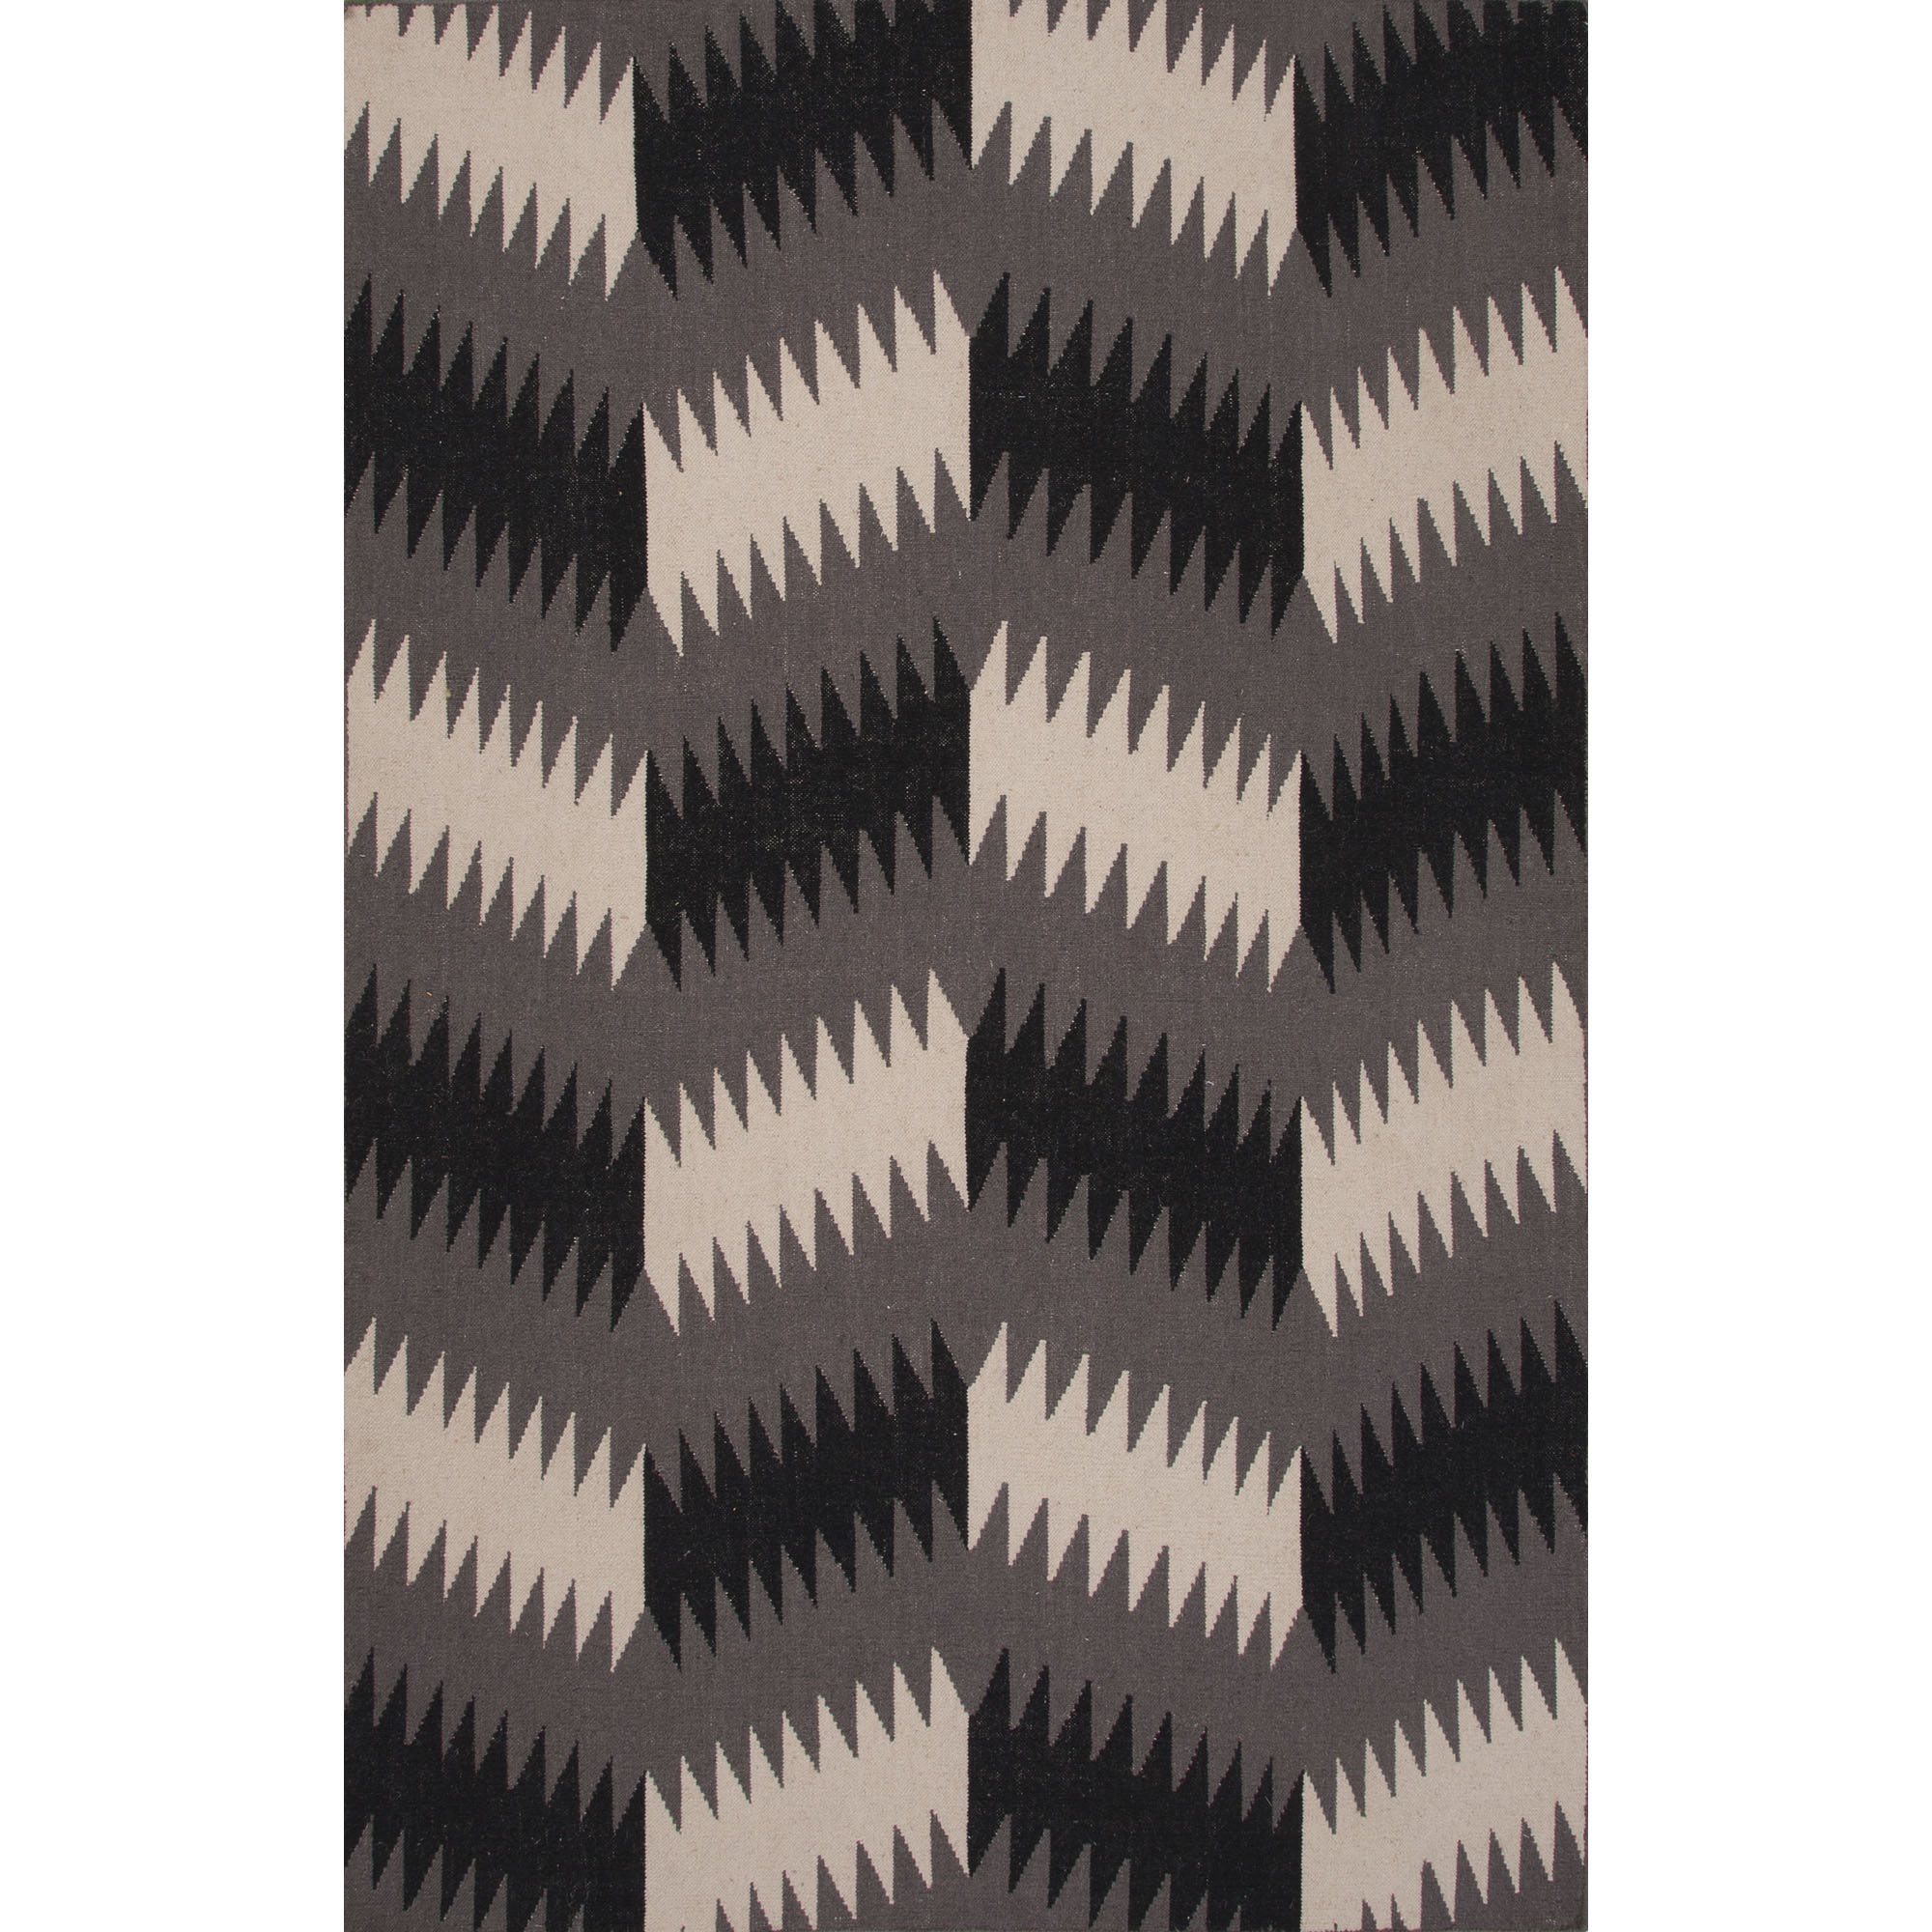 JAIPUR Rugs Traditions Modern Flat Weave 5 x 8 Rug - Item Number: RUG119848